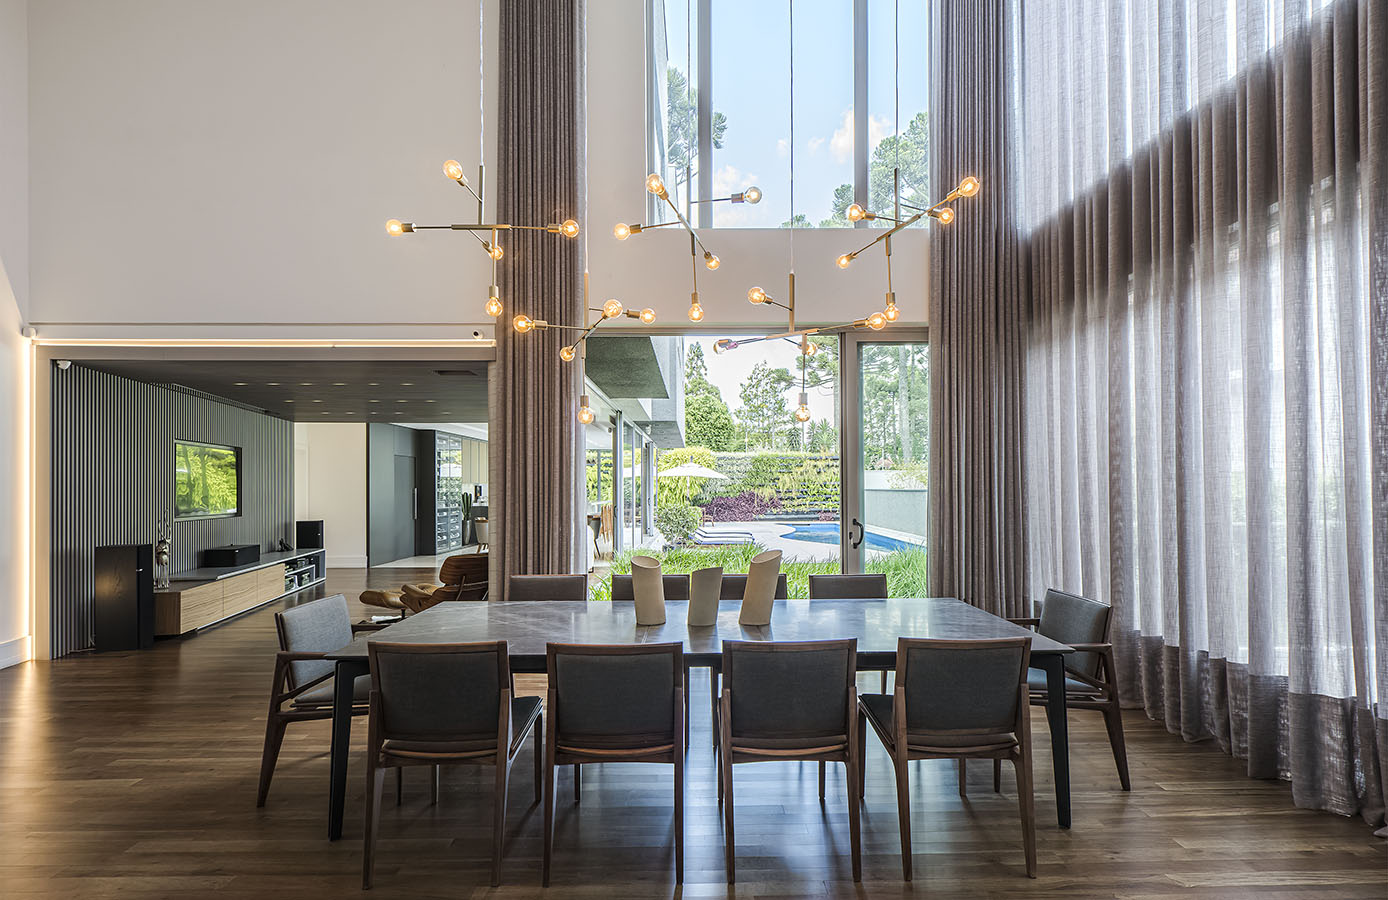 Arquiteto_Curitiba_Arquiteta_AlessandraGandolfi_Residência_AN_Interiores_5